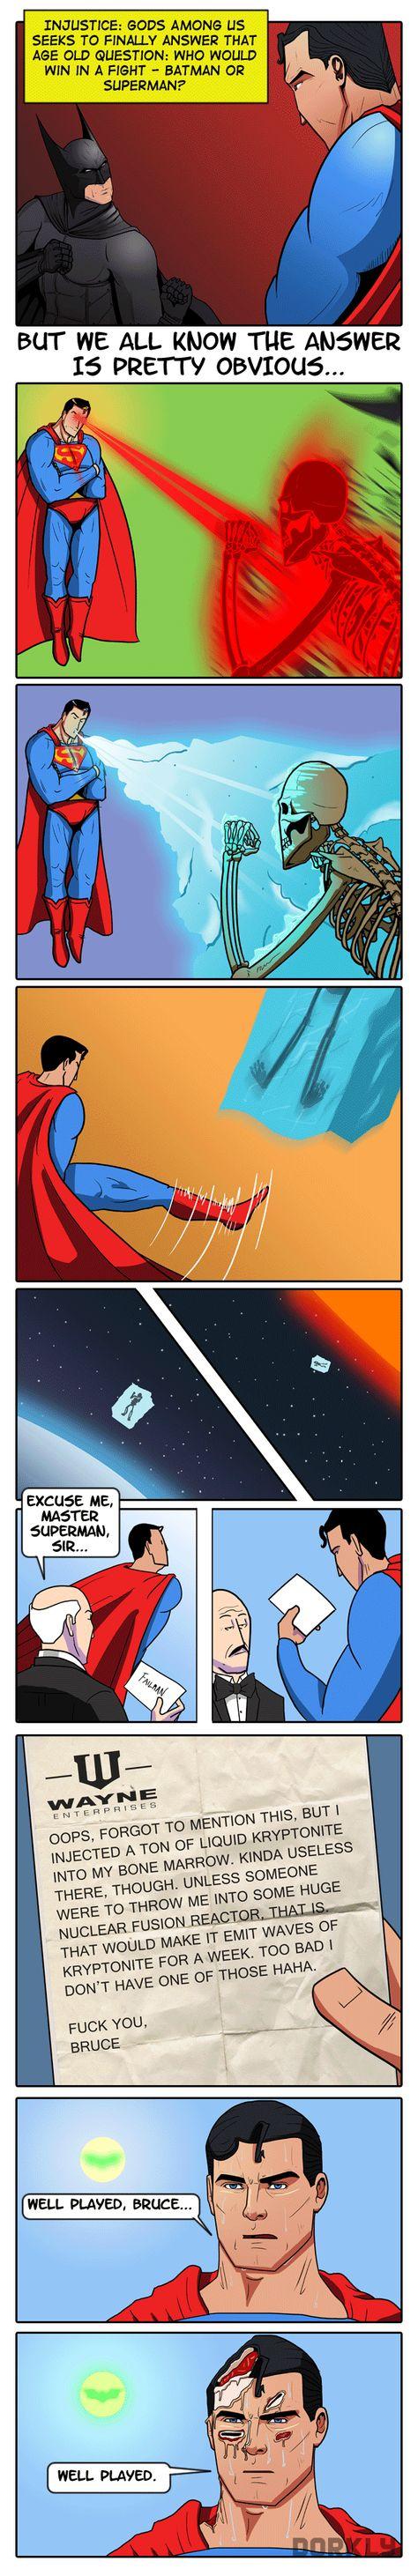 Injustice: Gods and Rich Mortals Among Us - Dorkly Comic BATMAN ALWAYS WINS